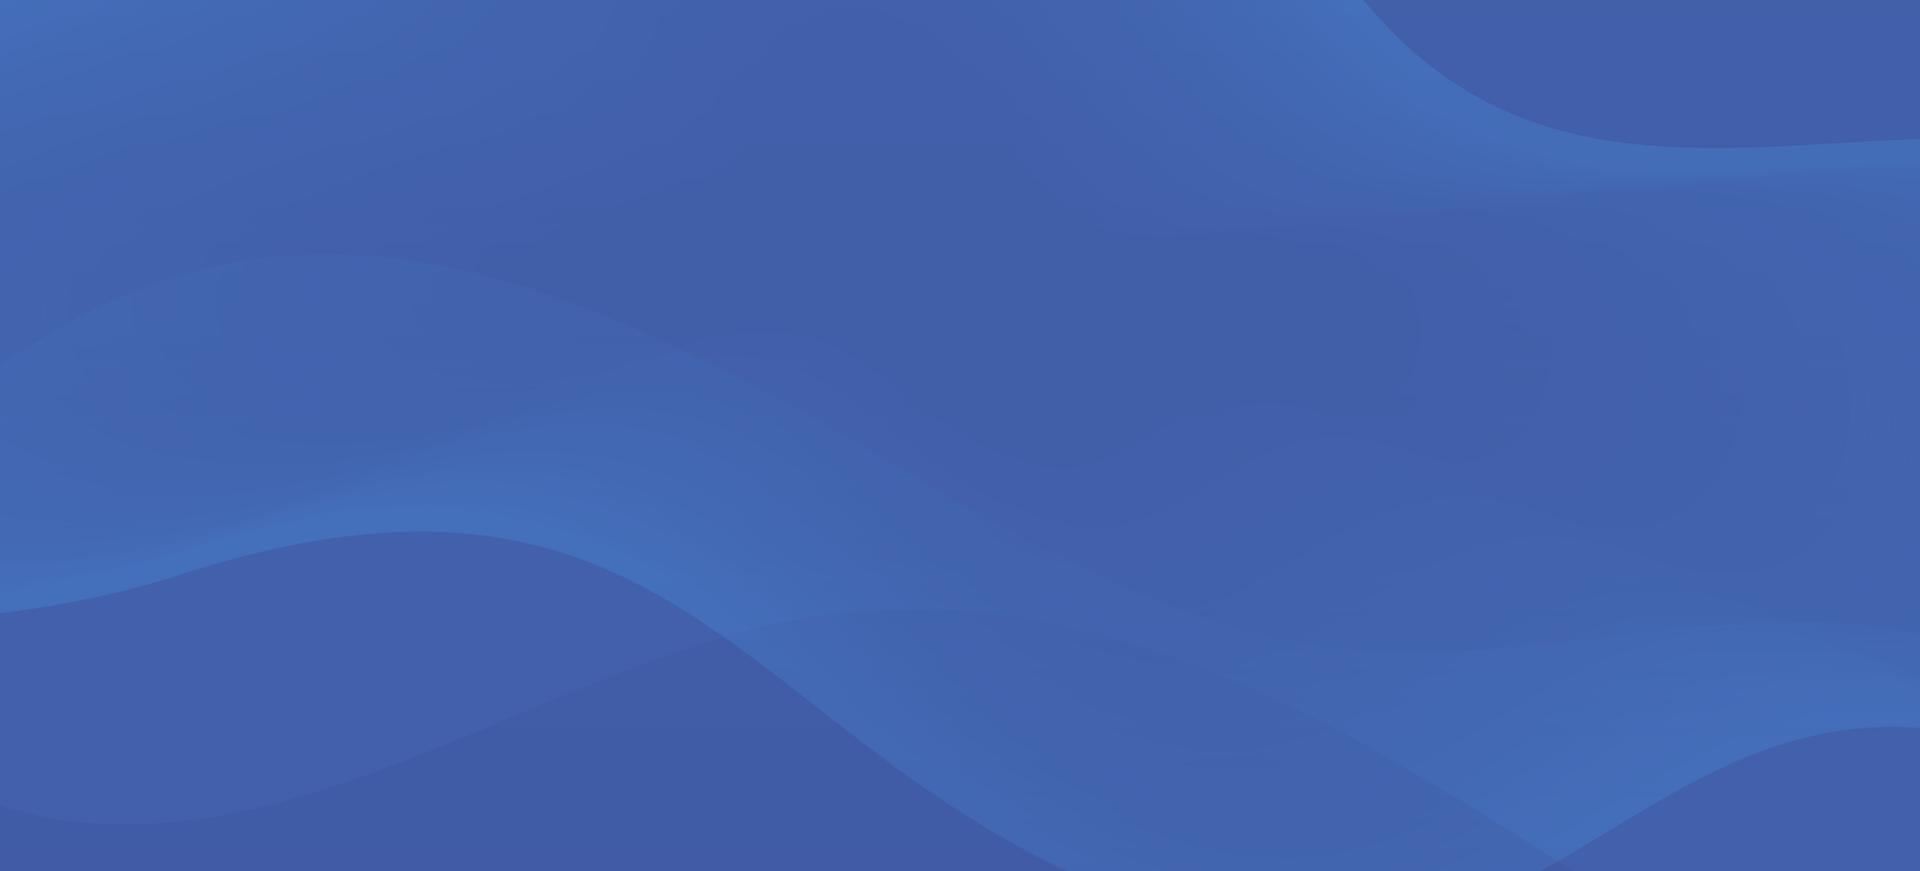 Hire Certified Microsoft Dynamics 365 Developer